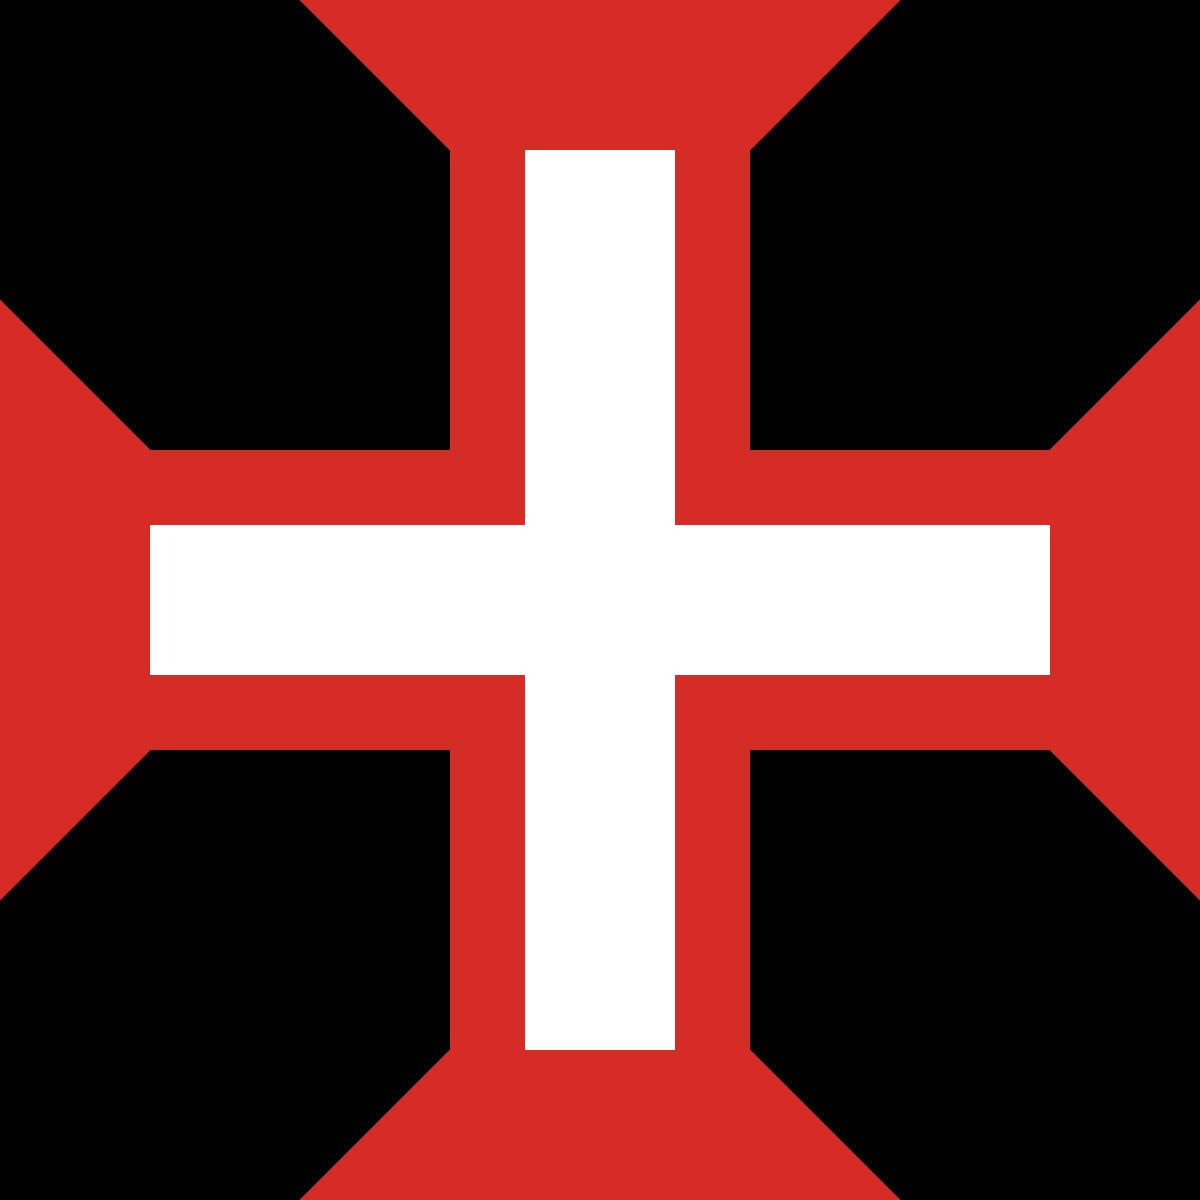 Clipart cross roman catholic. Order of christ portugal